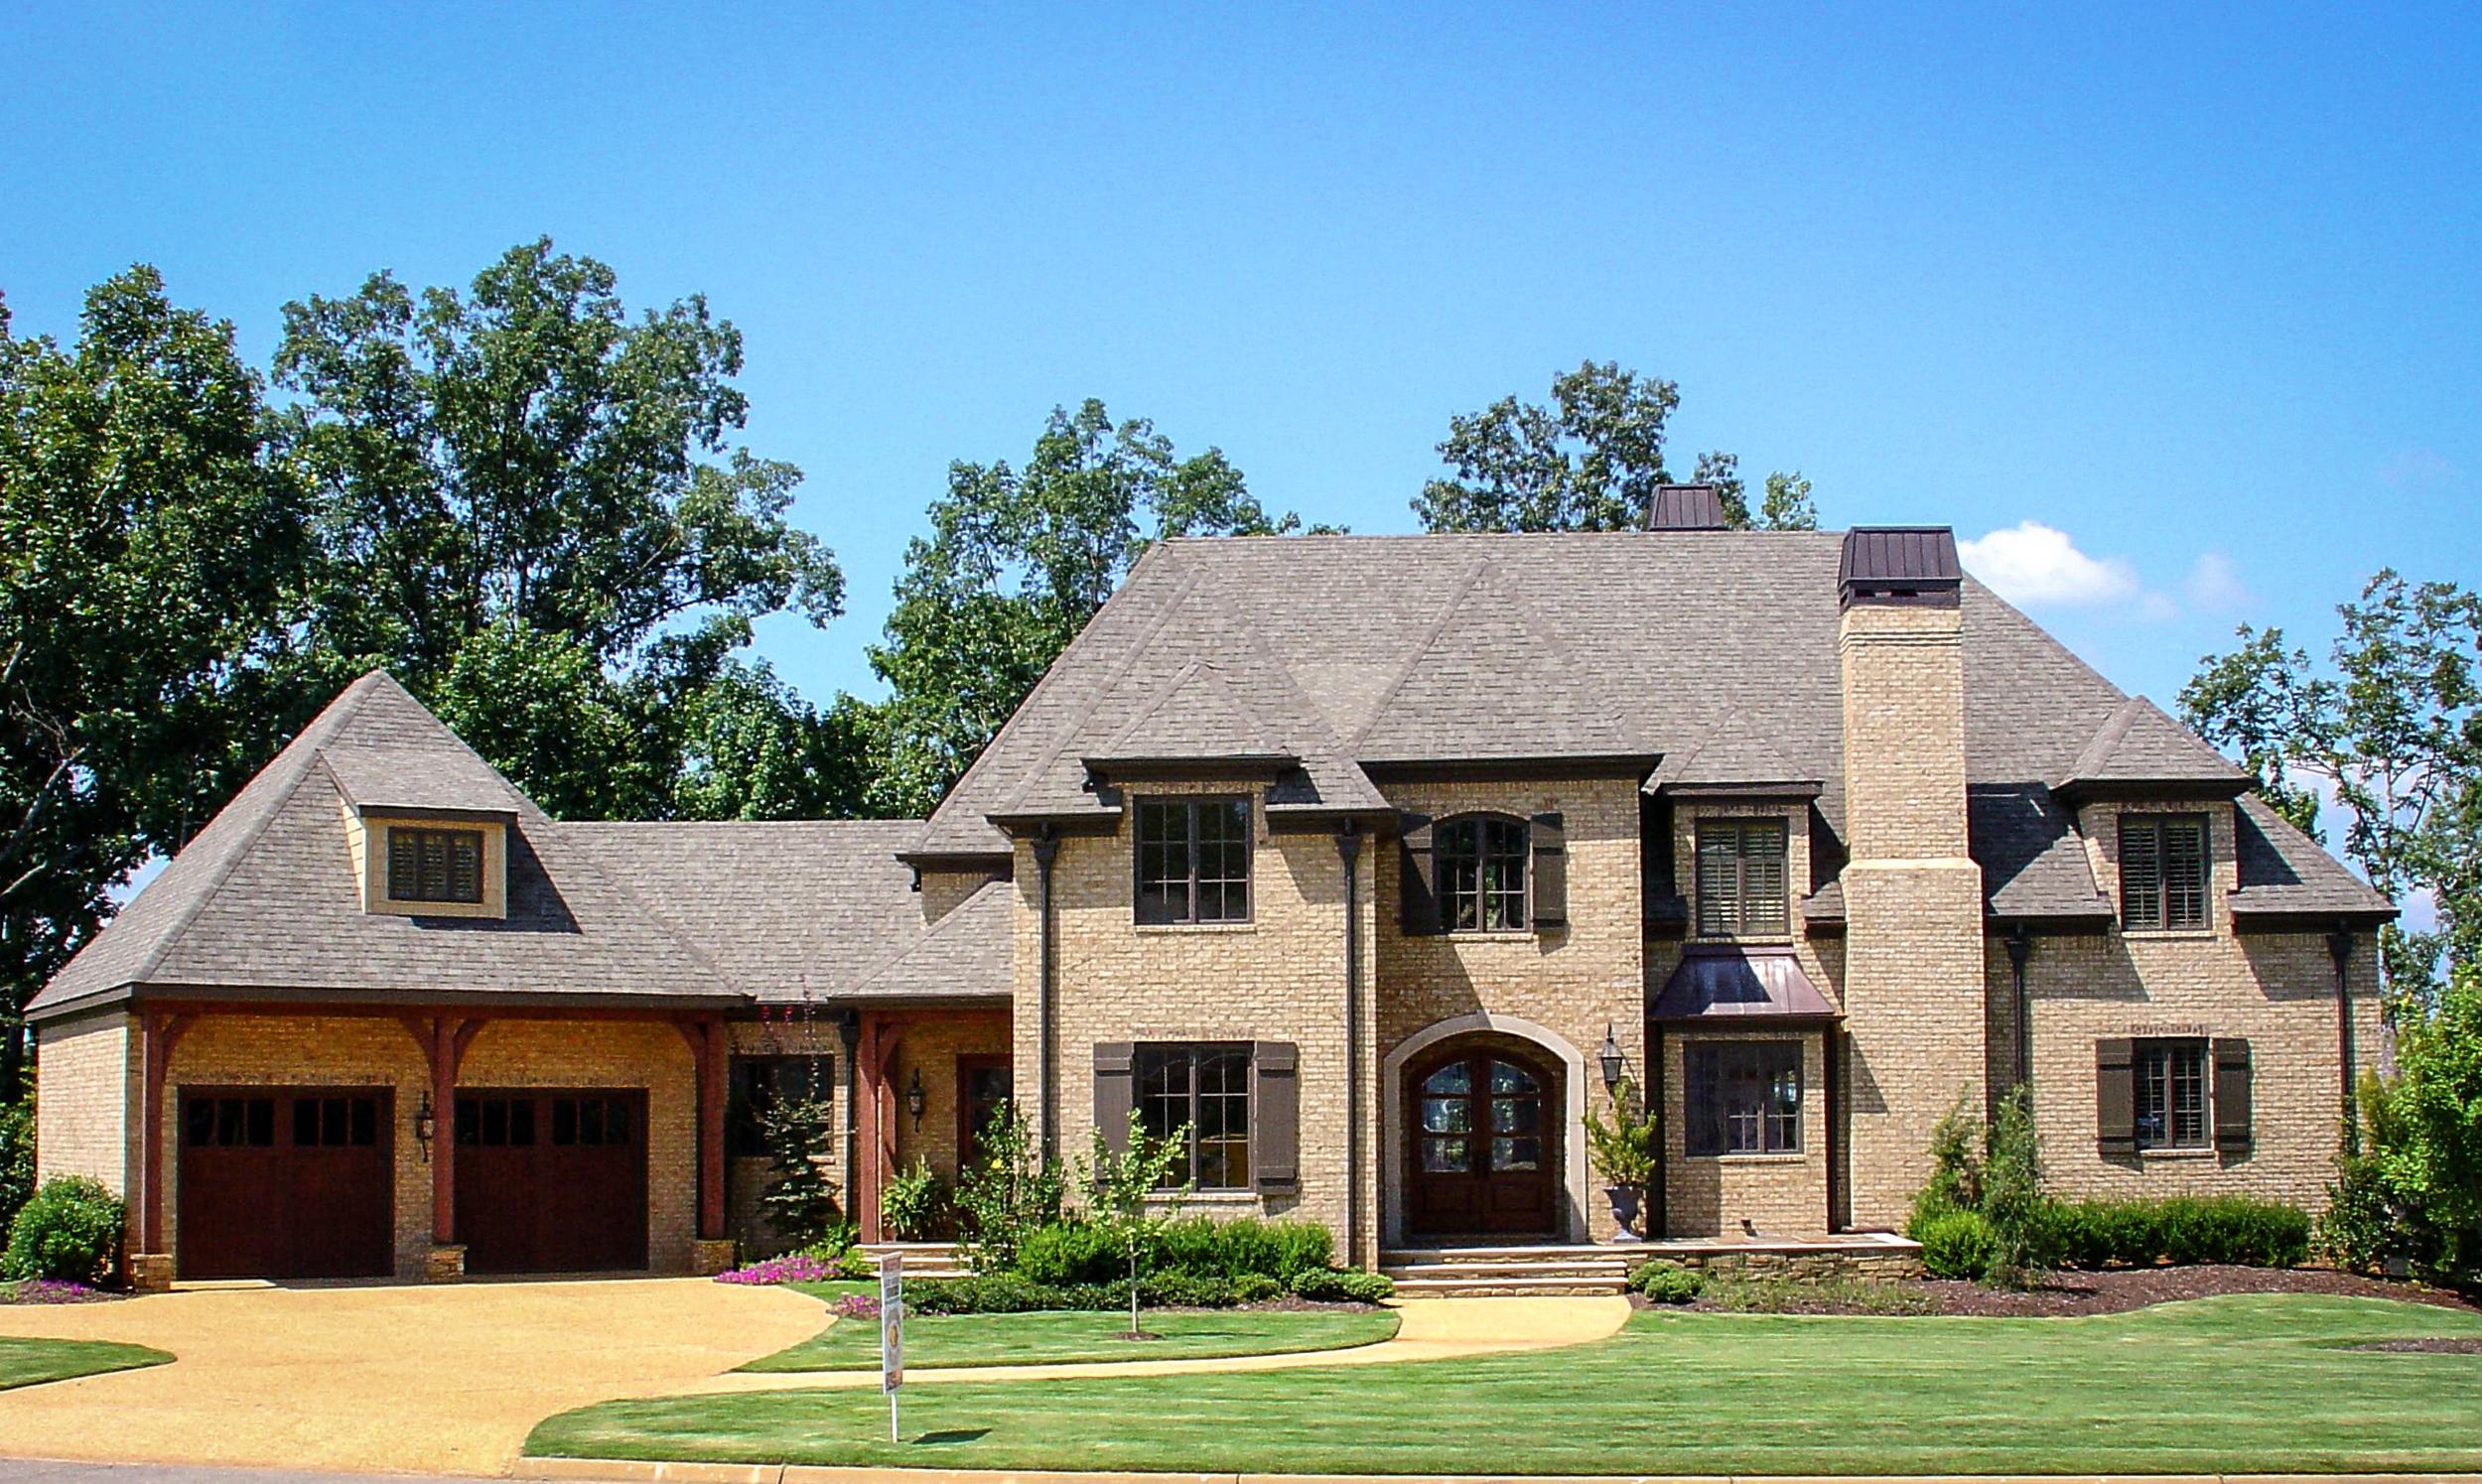 Toulmin Homes - Tuscaloosa, AL custom home builder and remodeler (1 of 4).jpg